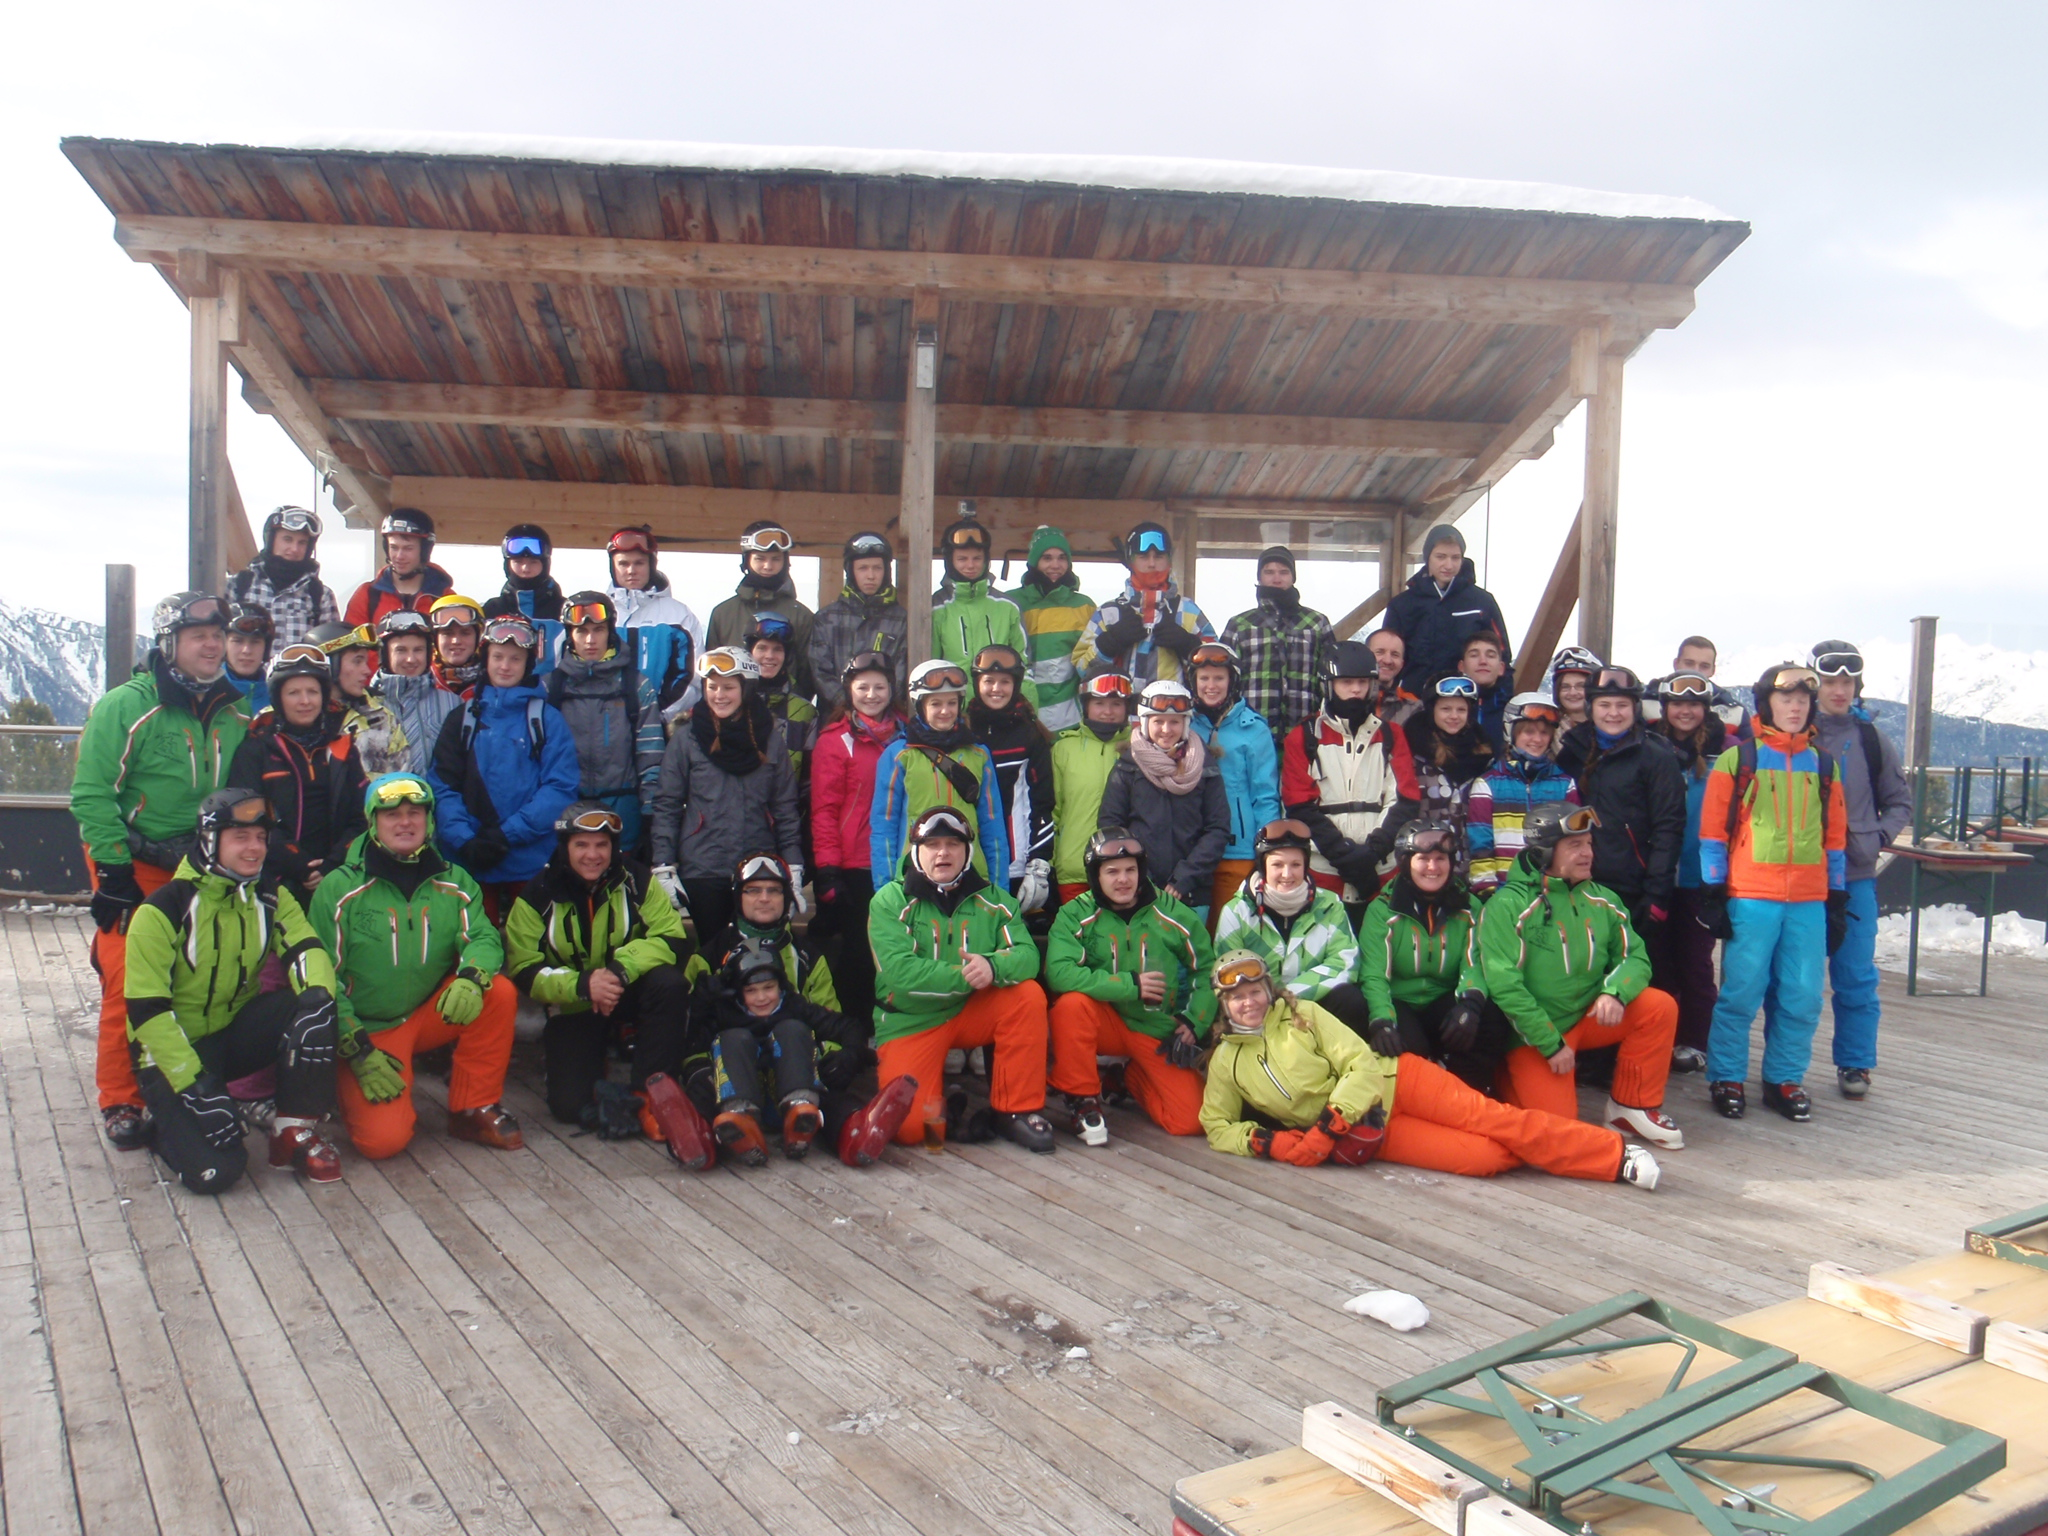 Jugendfreizeit 2015 (Gruppenbild)